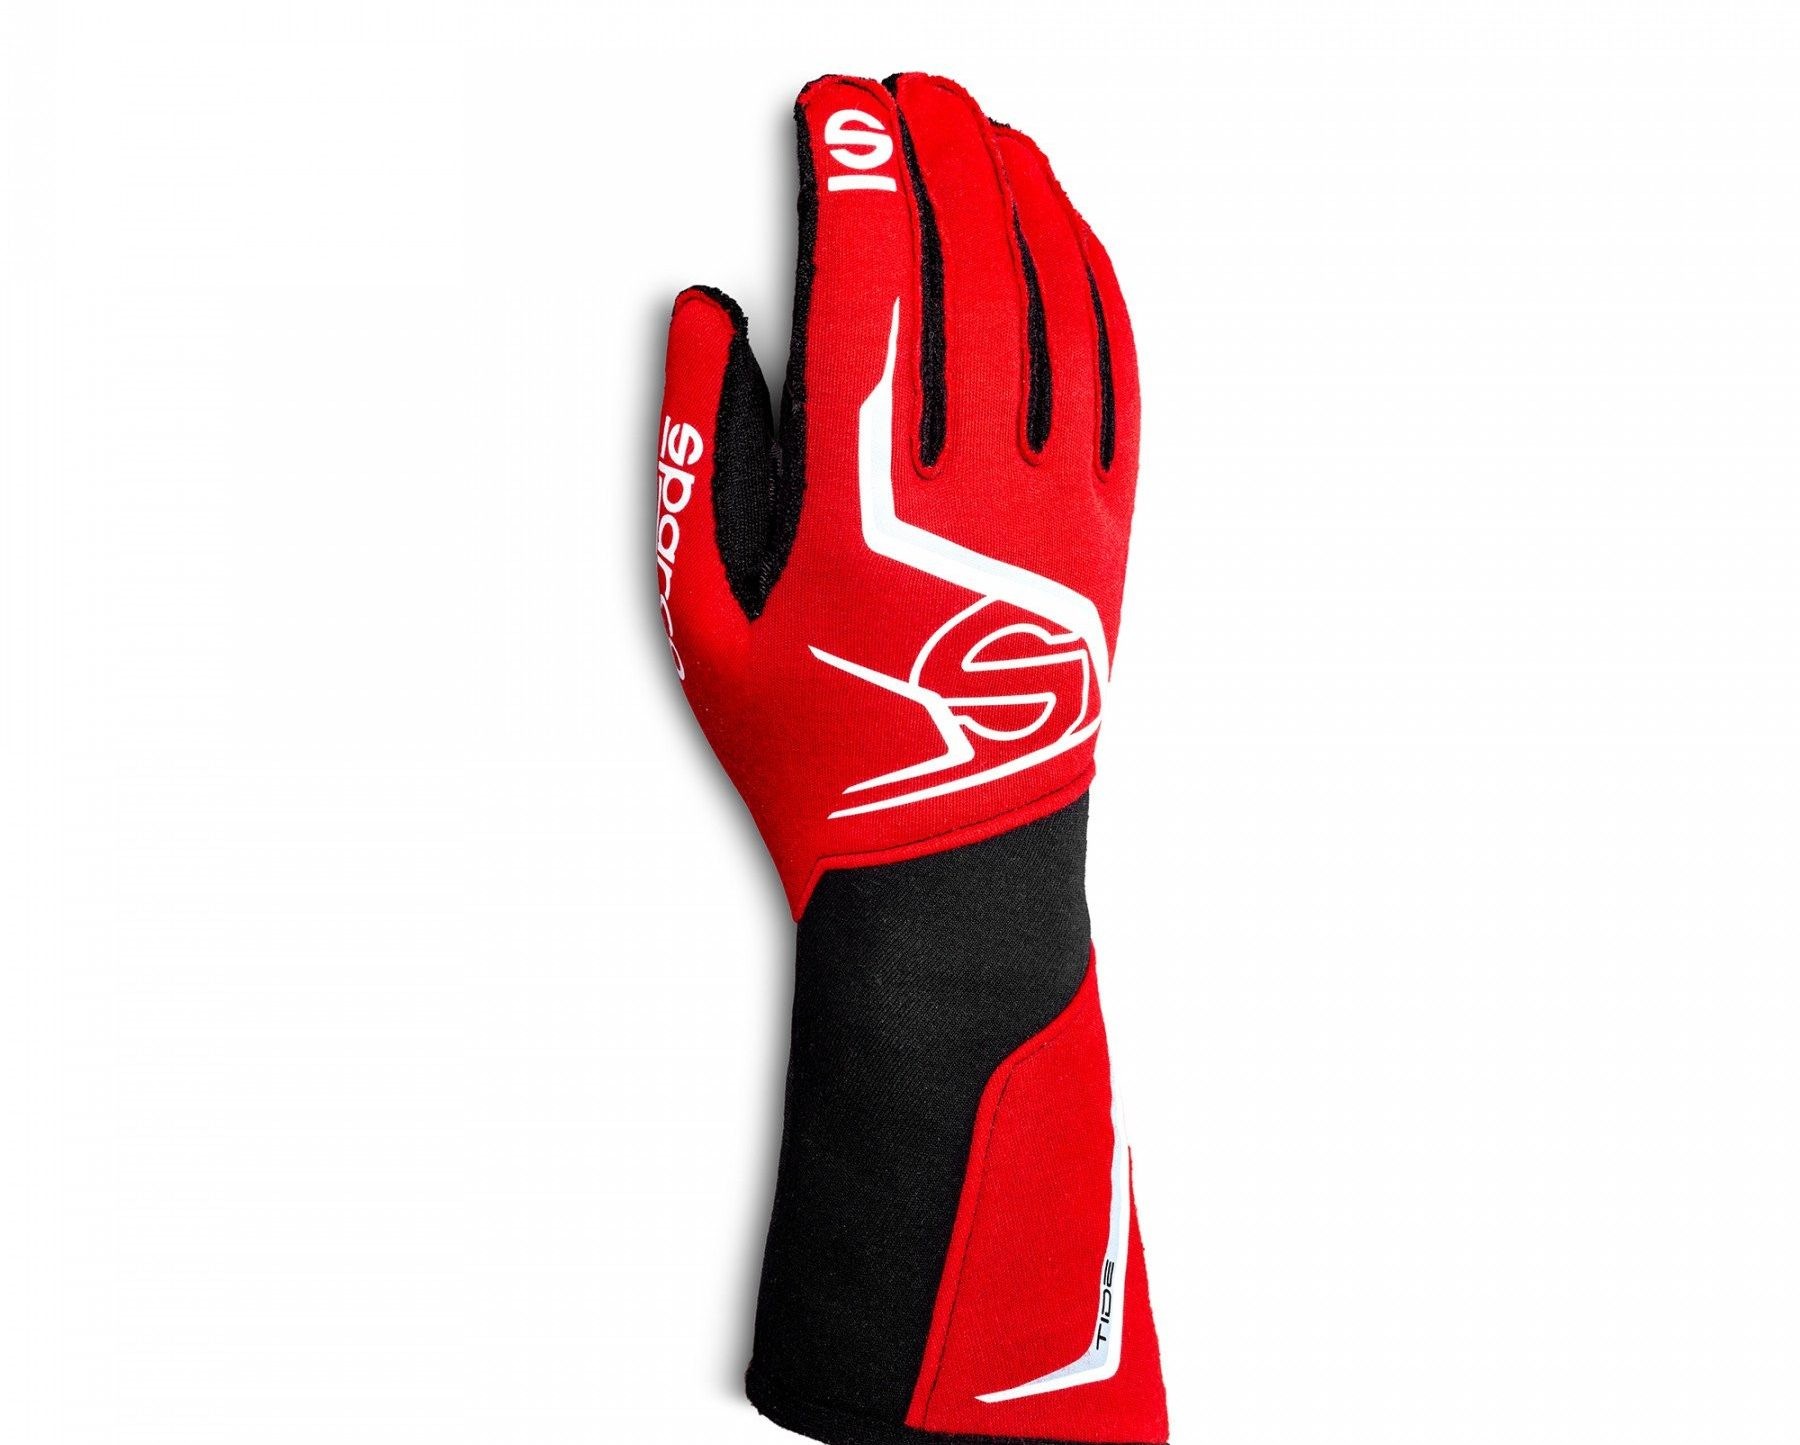 Нов продукт: Sparco Tide, FIA Gloves